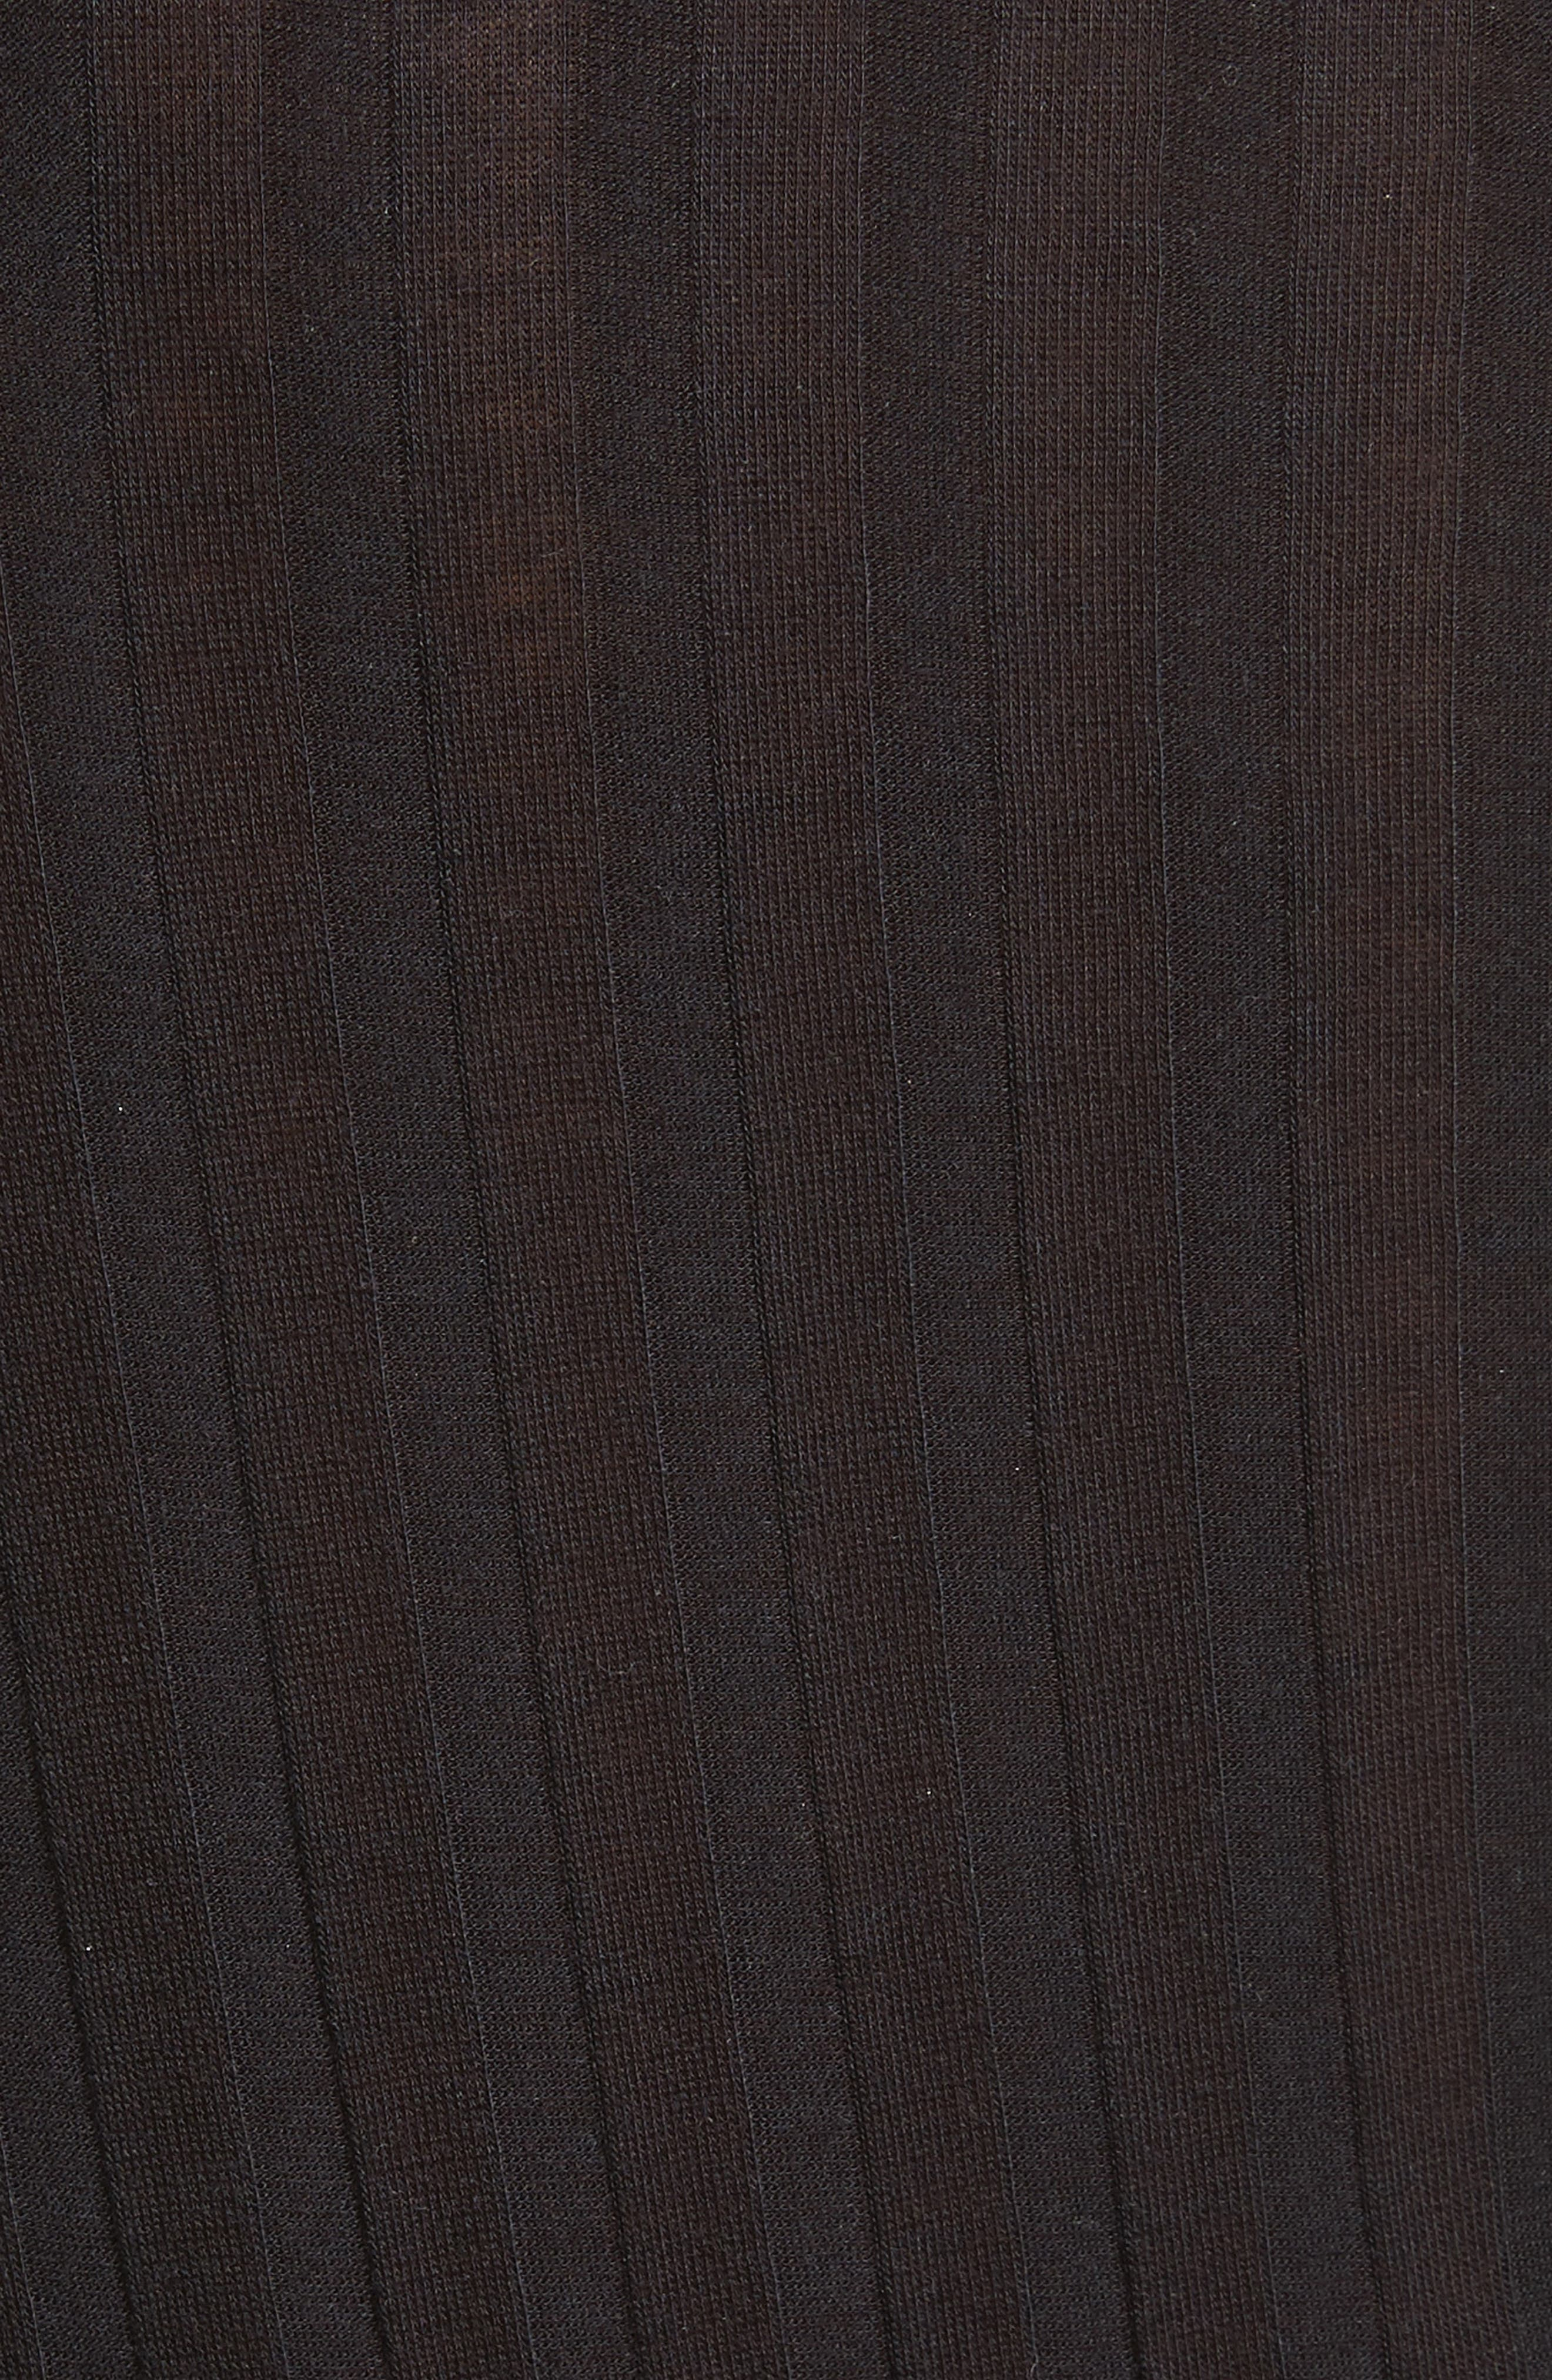 Lookout One-Shoulder Jersey Bodysuit,                             Alternate thumbnail 5, color,